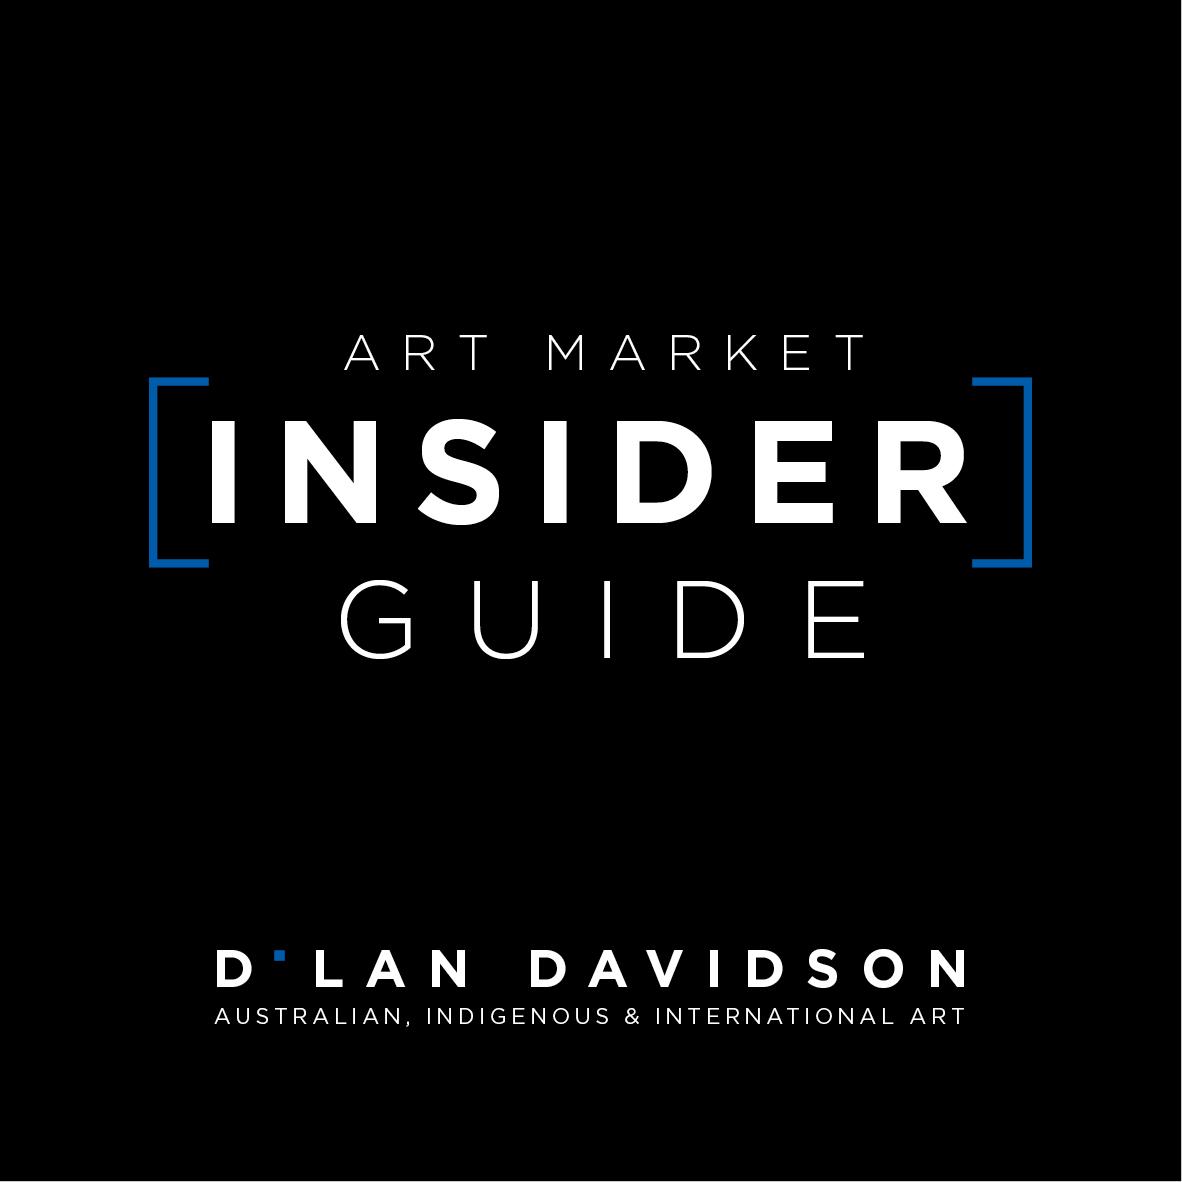 ART MARKET INSIDER GUIDE LOGO final 2.jpg